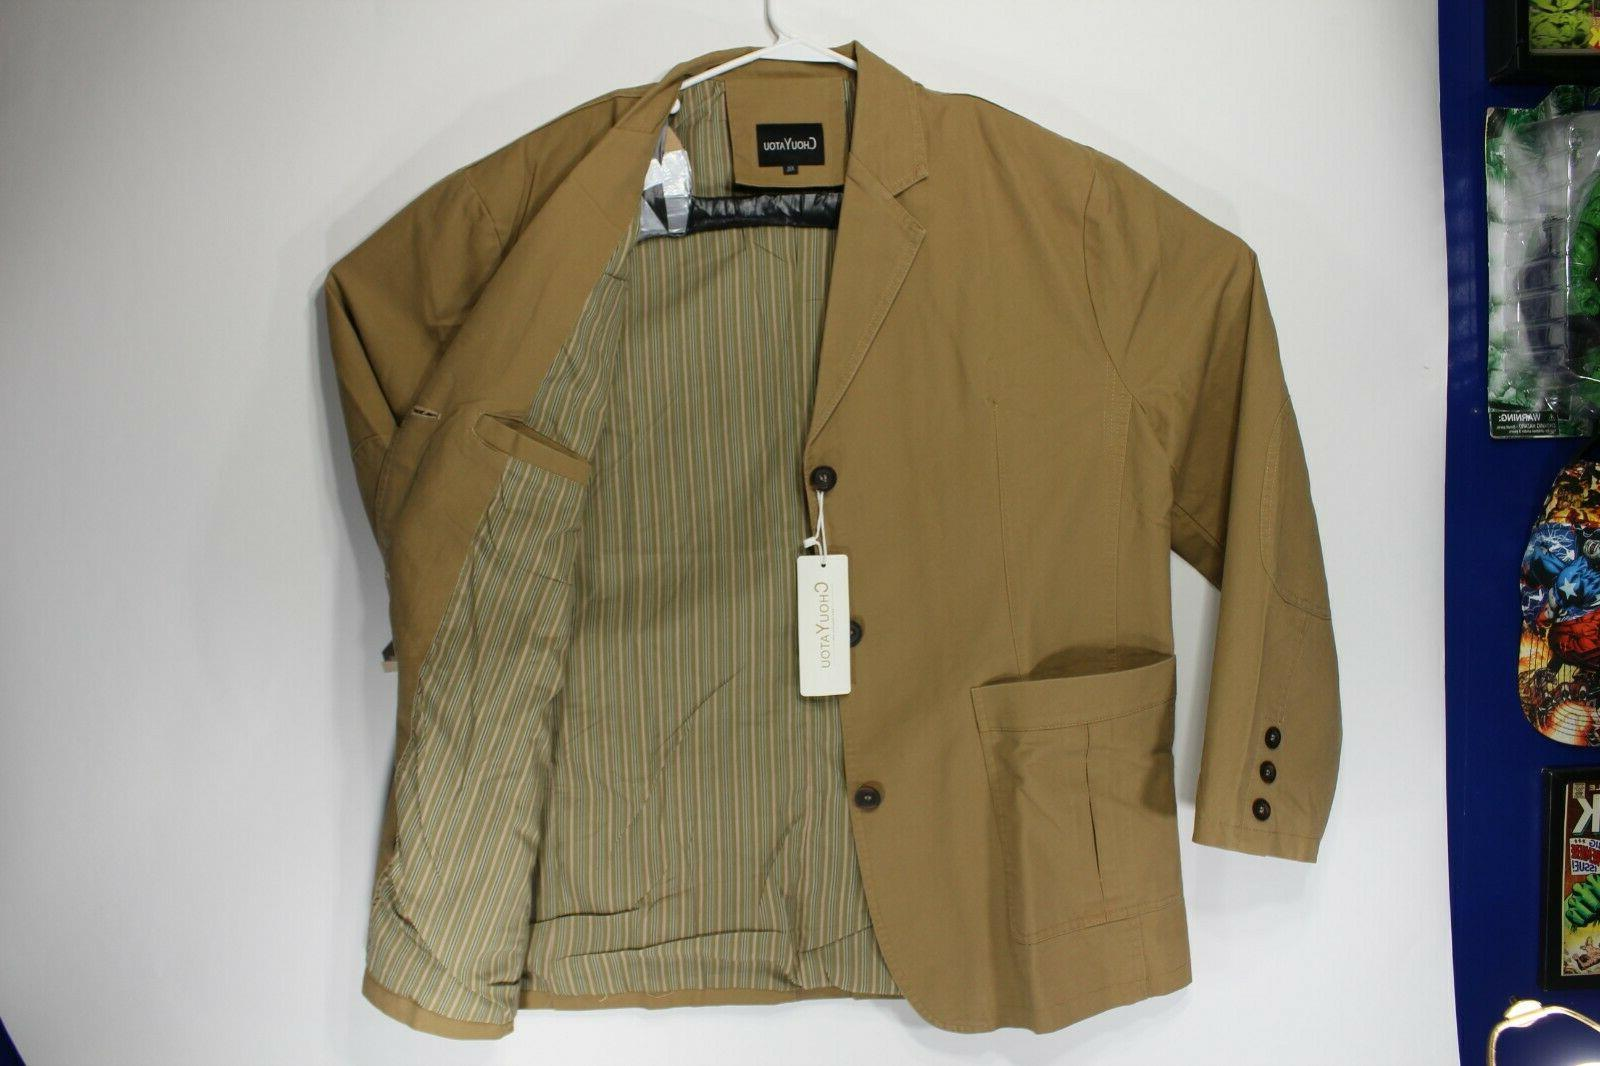 ChouYatou Cotton Twill Jacket, Khaki, Stripe Button